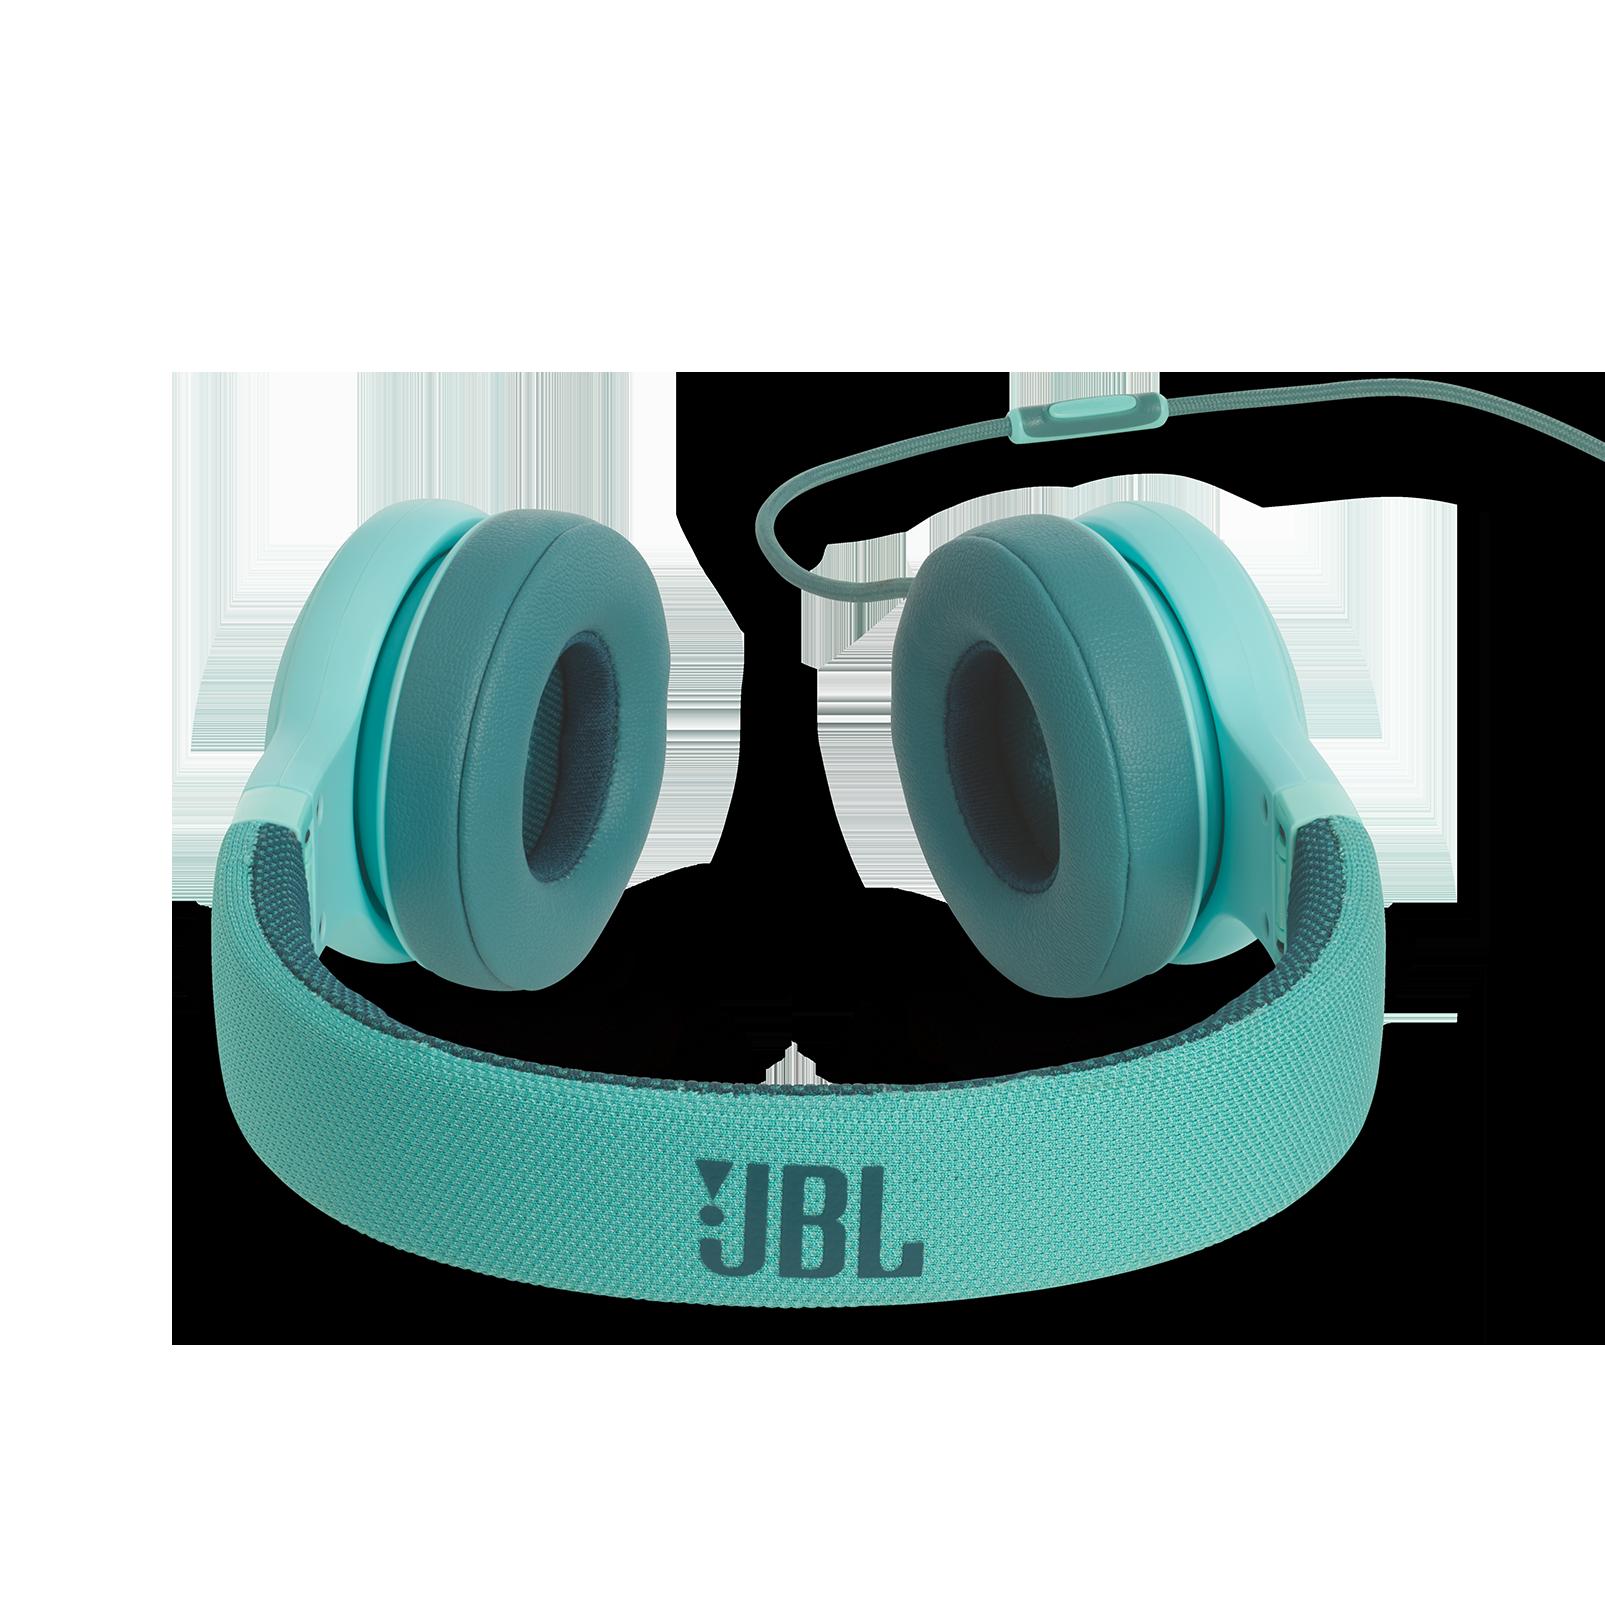 E35 - Teal - On-ear headphones - Detailshot 4